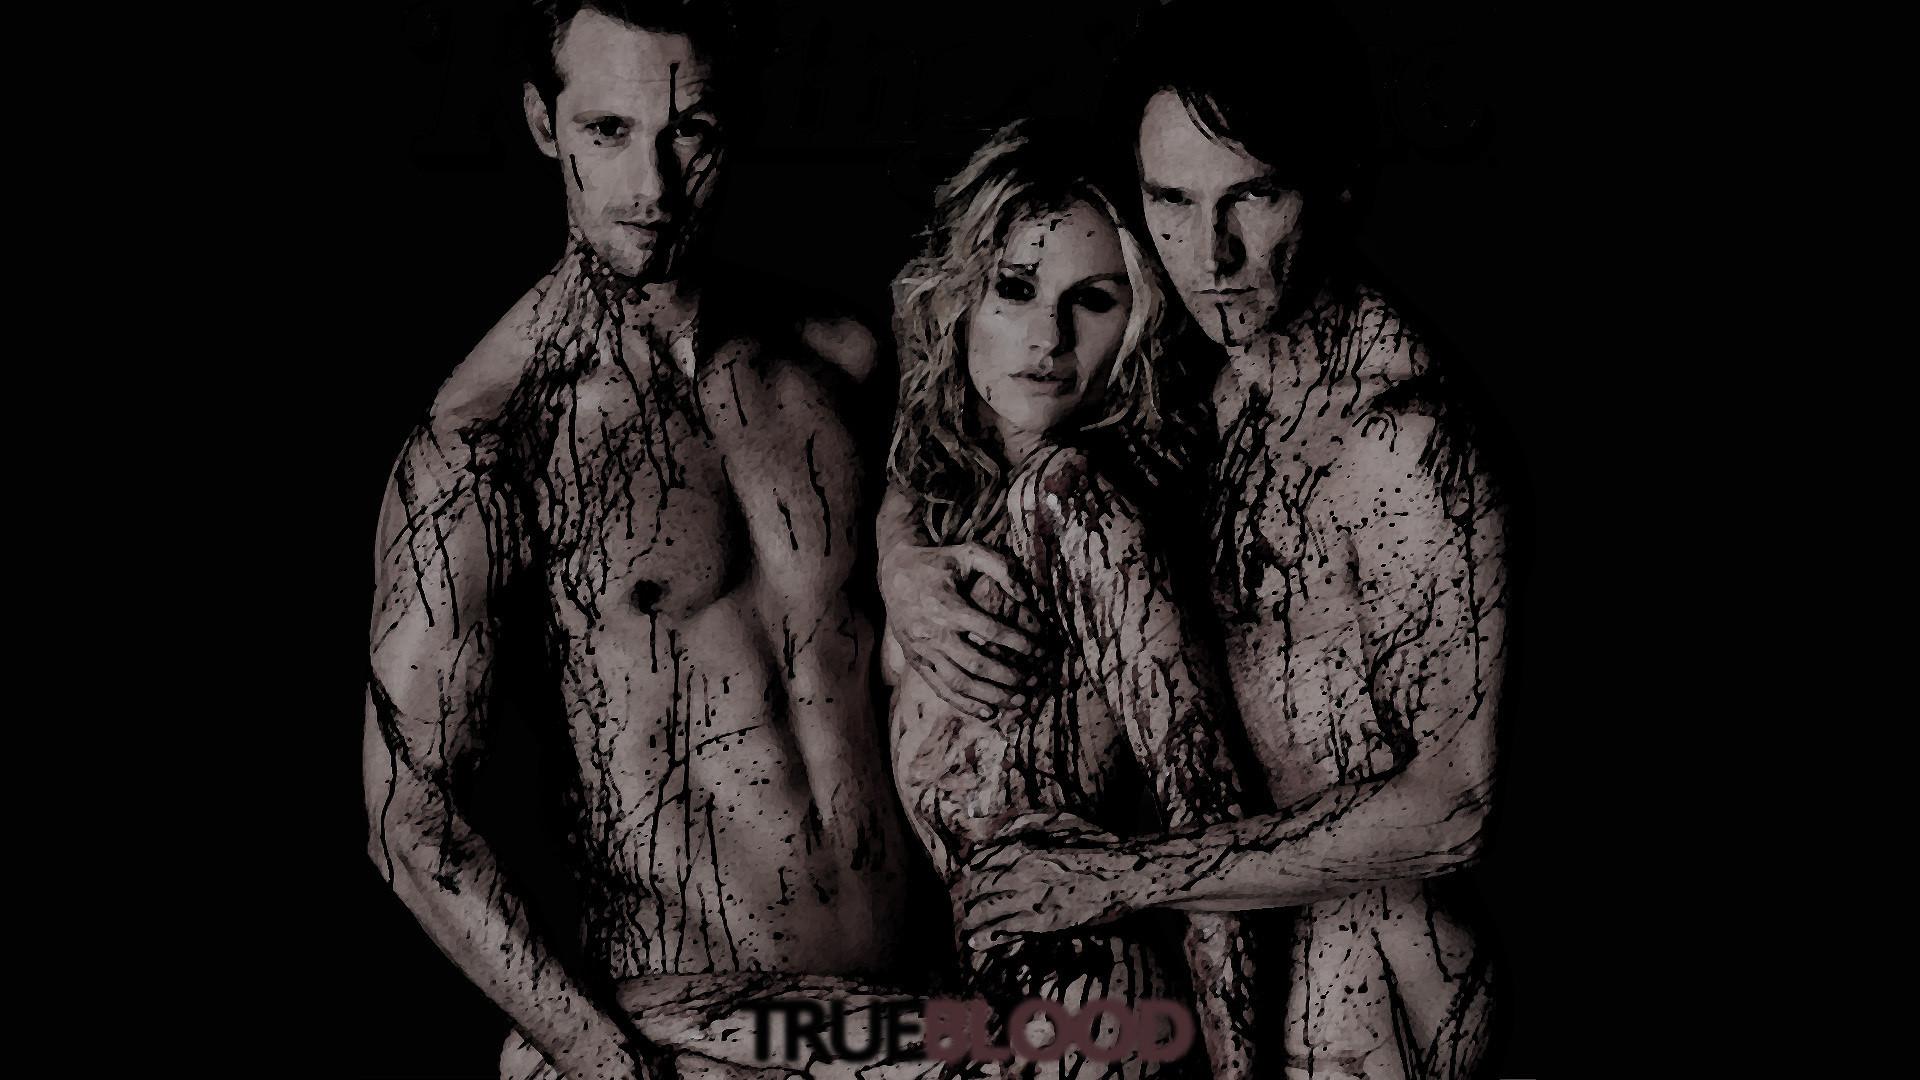 Britney spears true blood wallpaper from blood wallpapers.